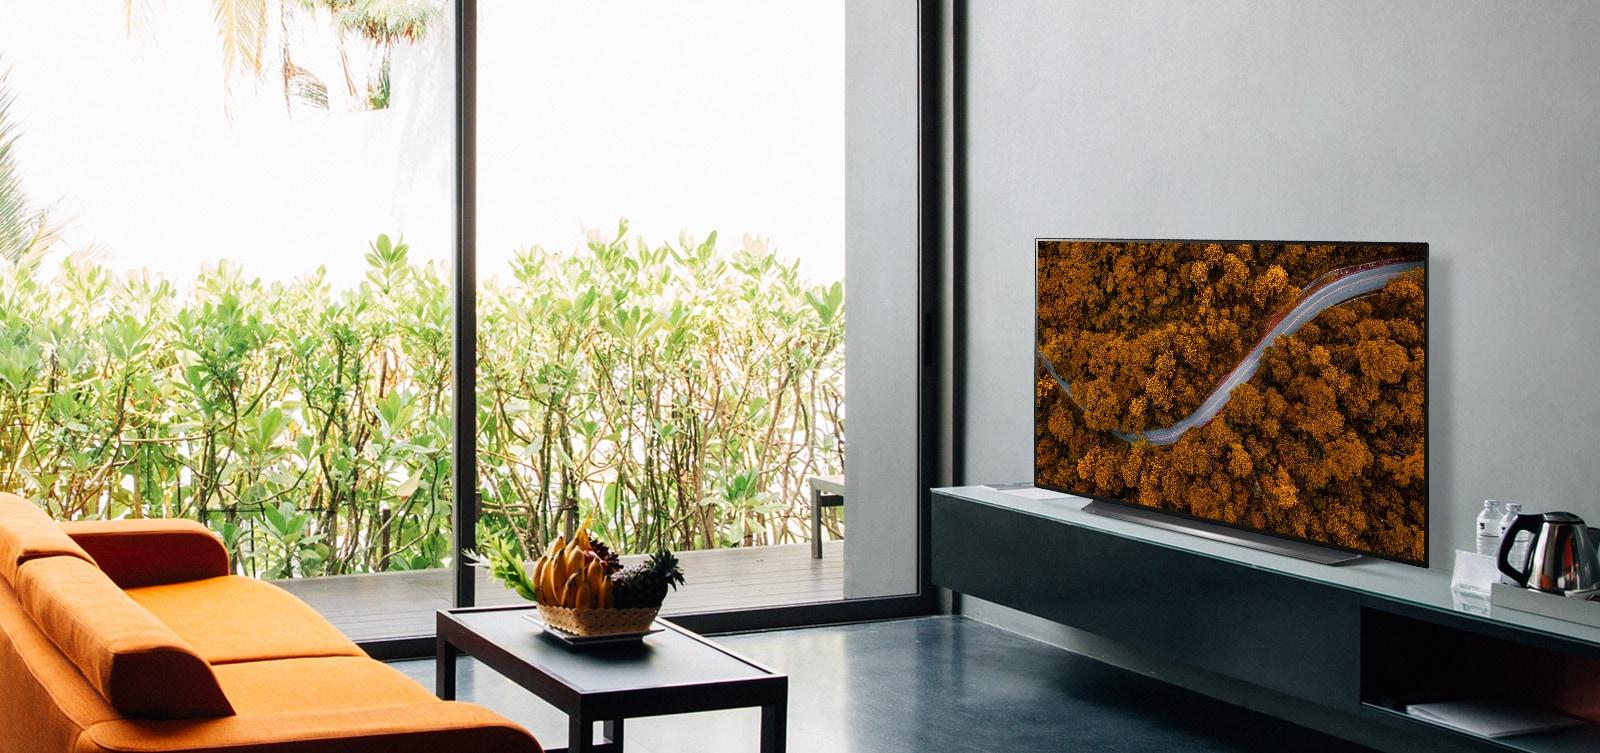 TV-OLED-48-CX-24-Design-Desktop.jpg (1600×753)